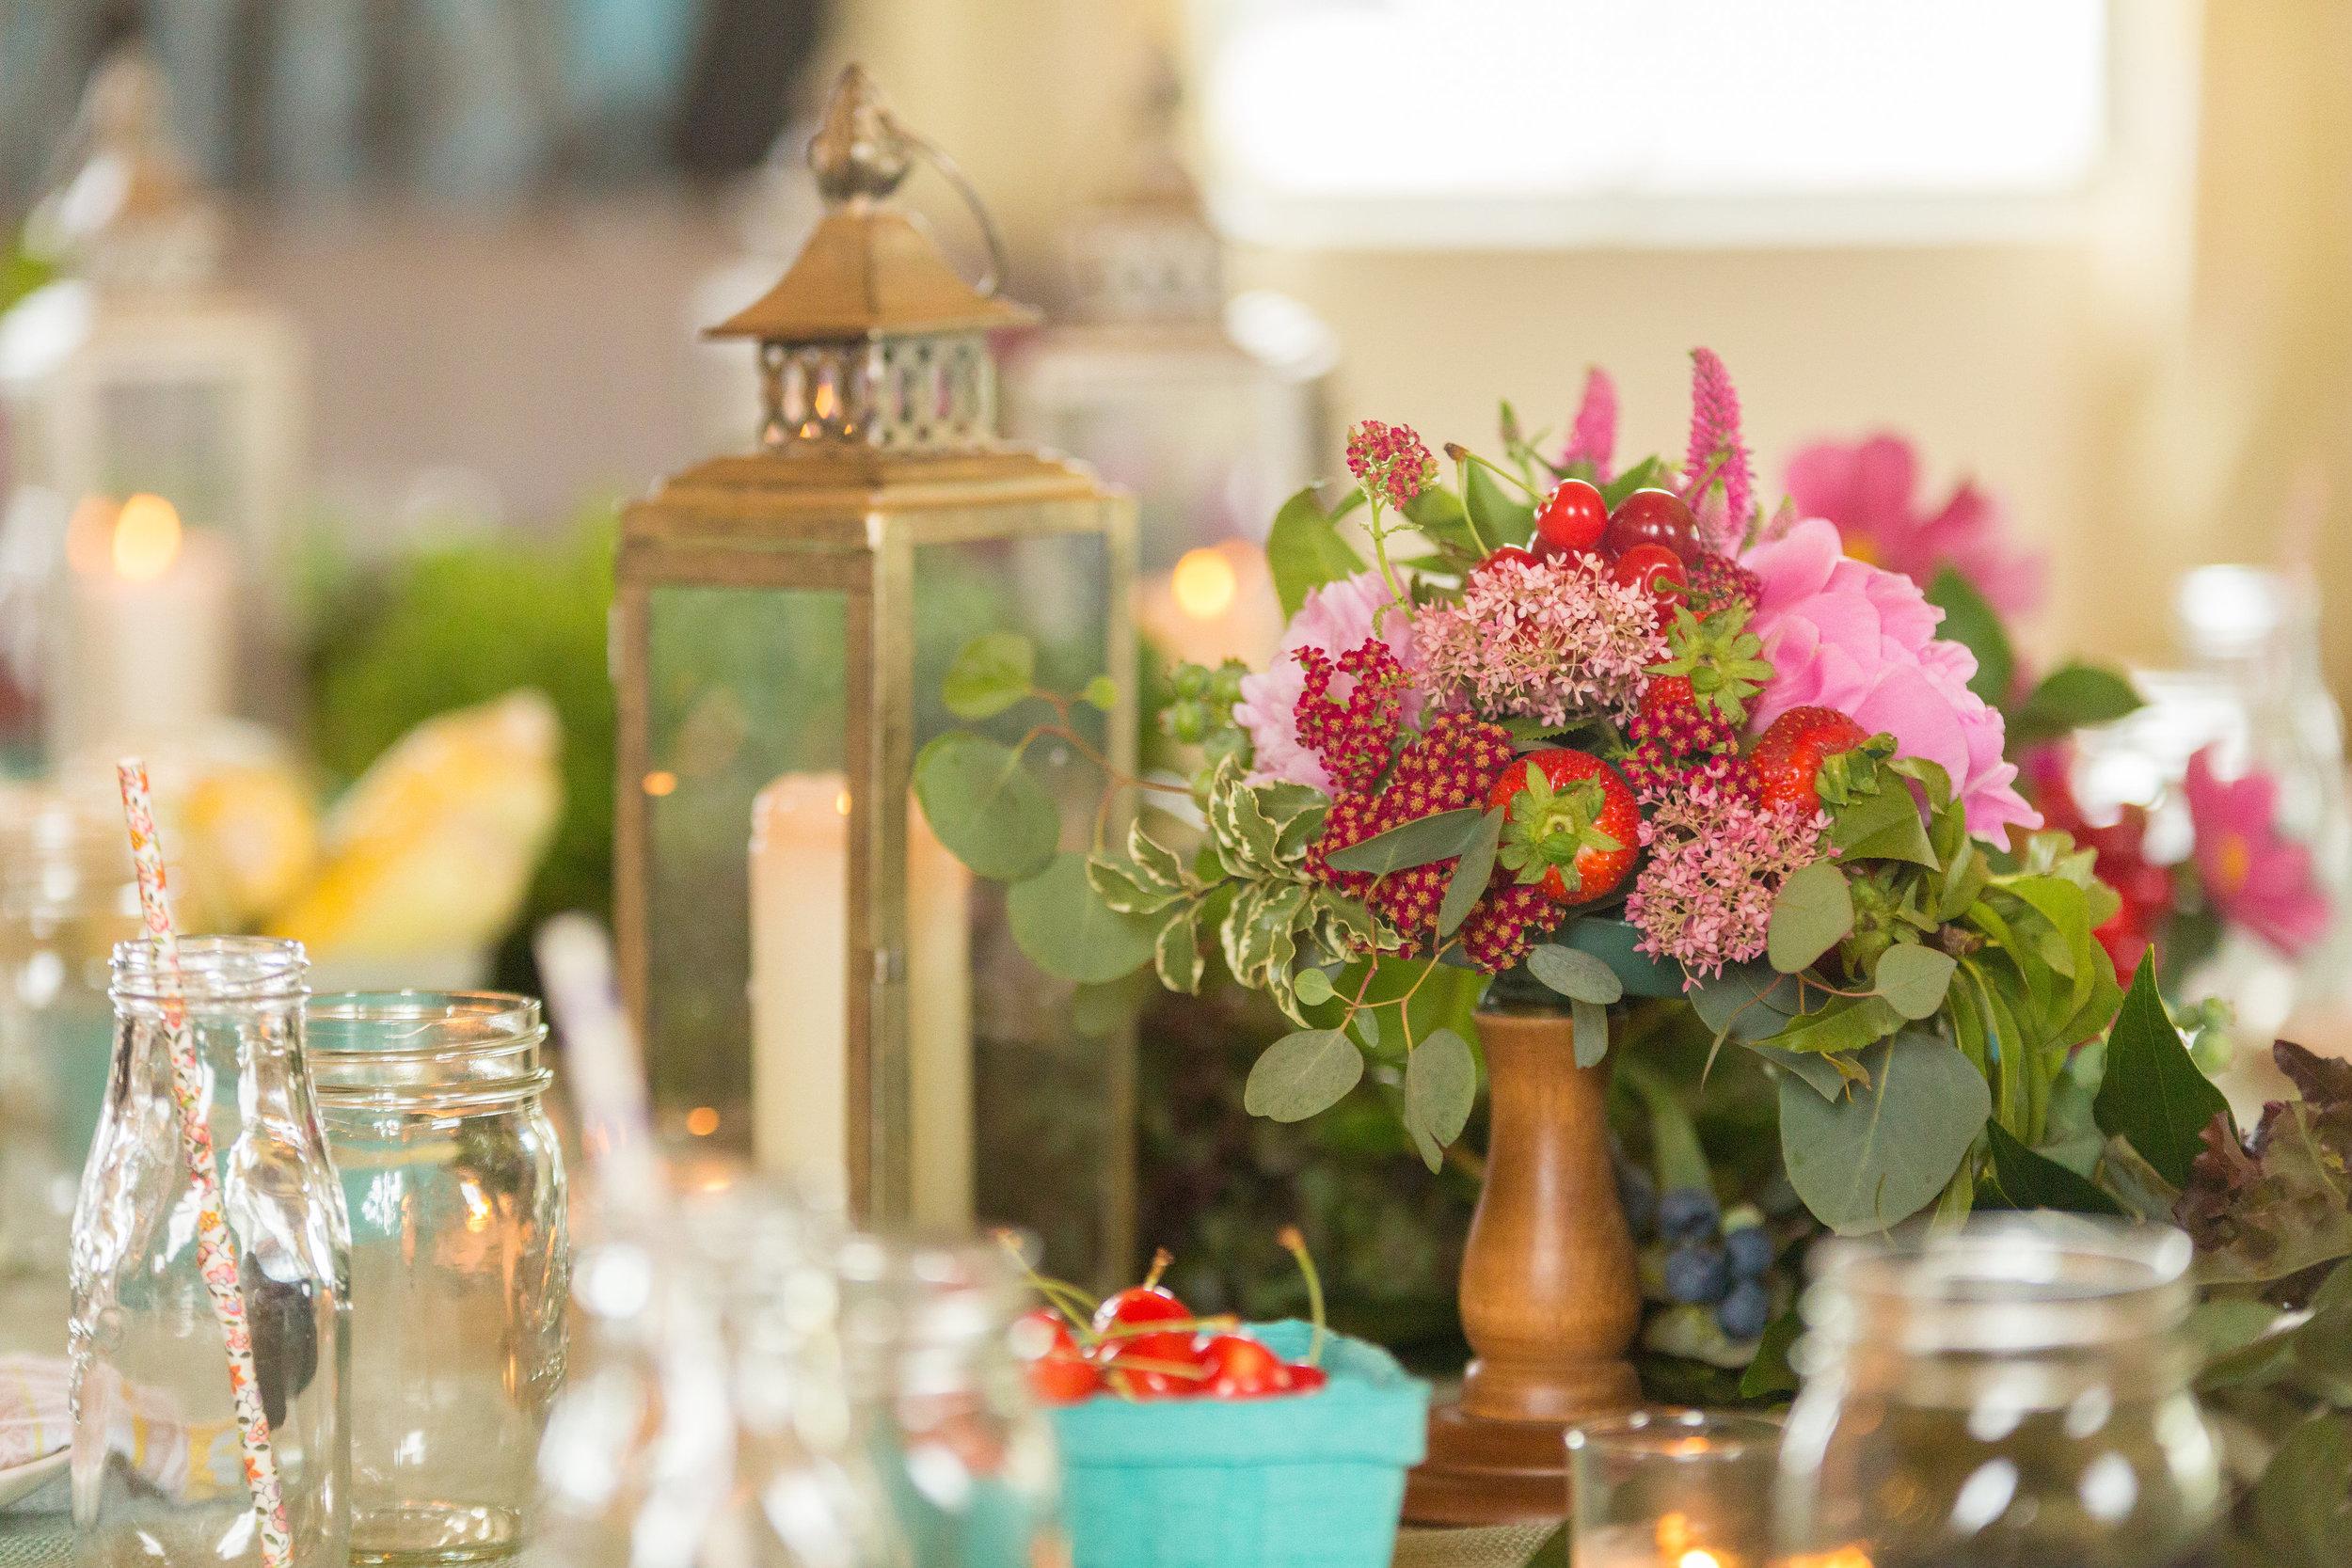 Danielle-Jeff-Farm-to-table-wedding-photography-love-story-studios-0022.jpg